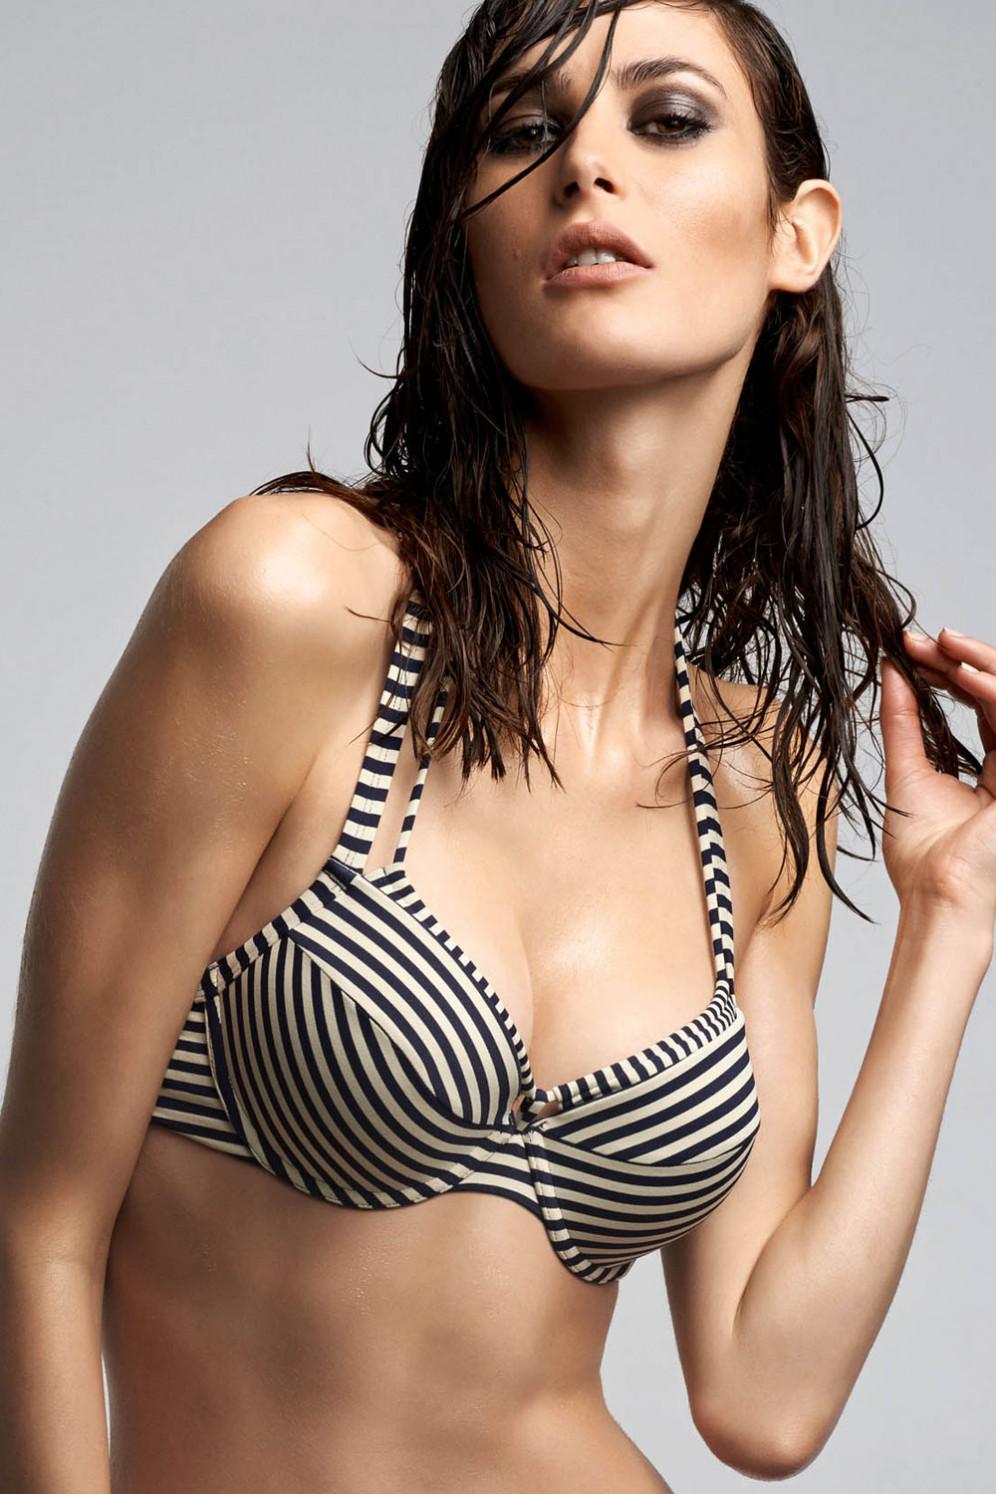 b9ad107b88 Vergrößern Abbildung zu Push-Up-Bikini-Oberteil (18191) der Marke Marlies  Dekkers ...